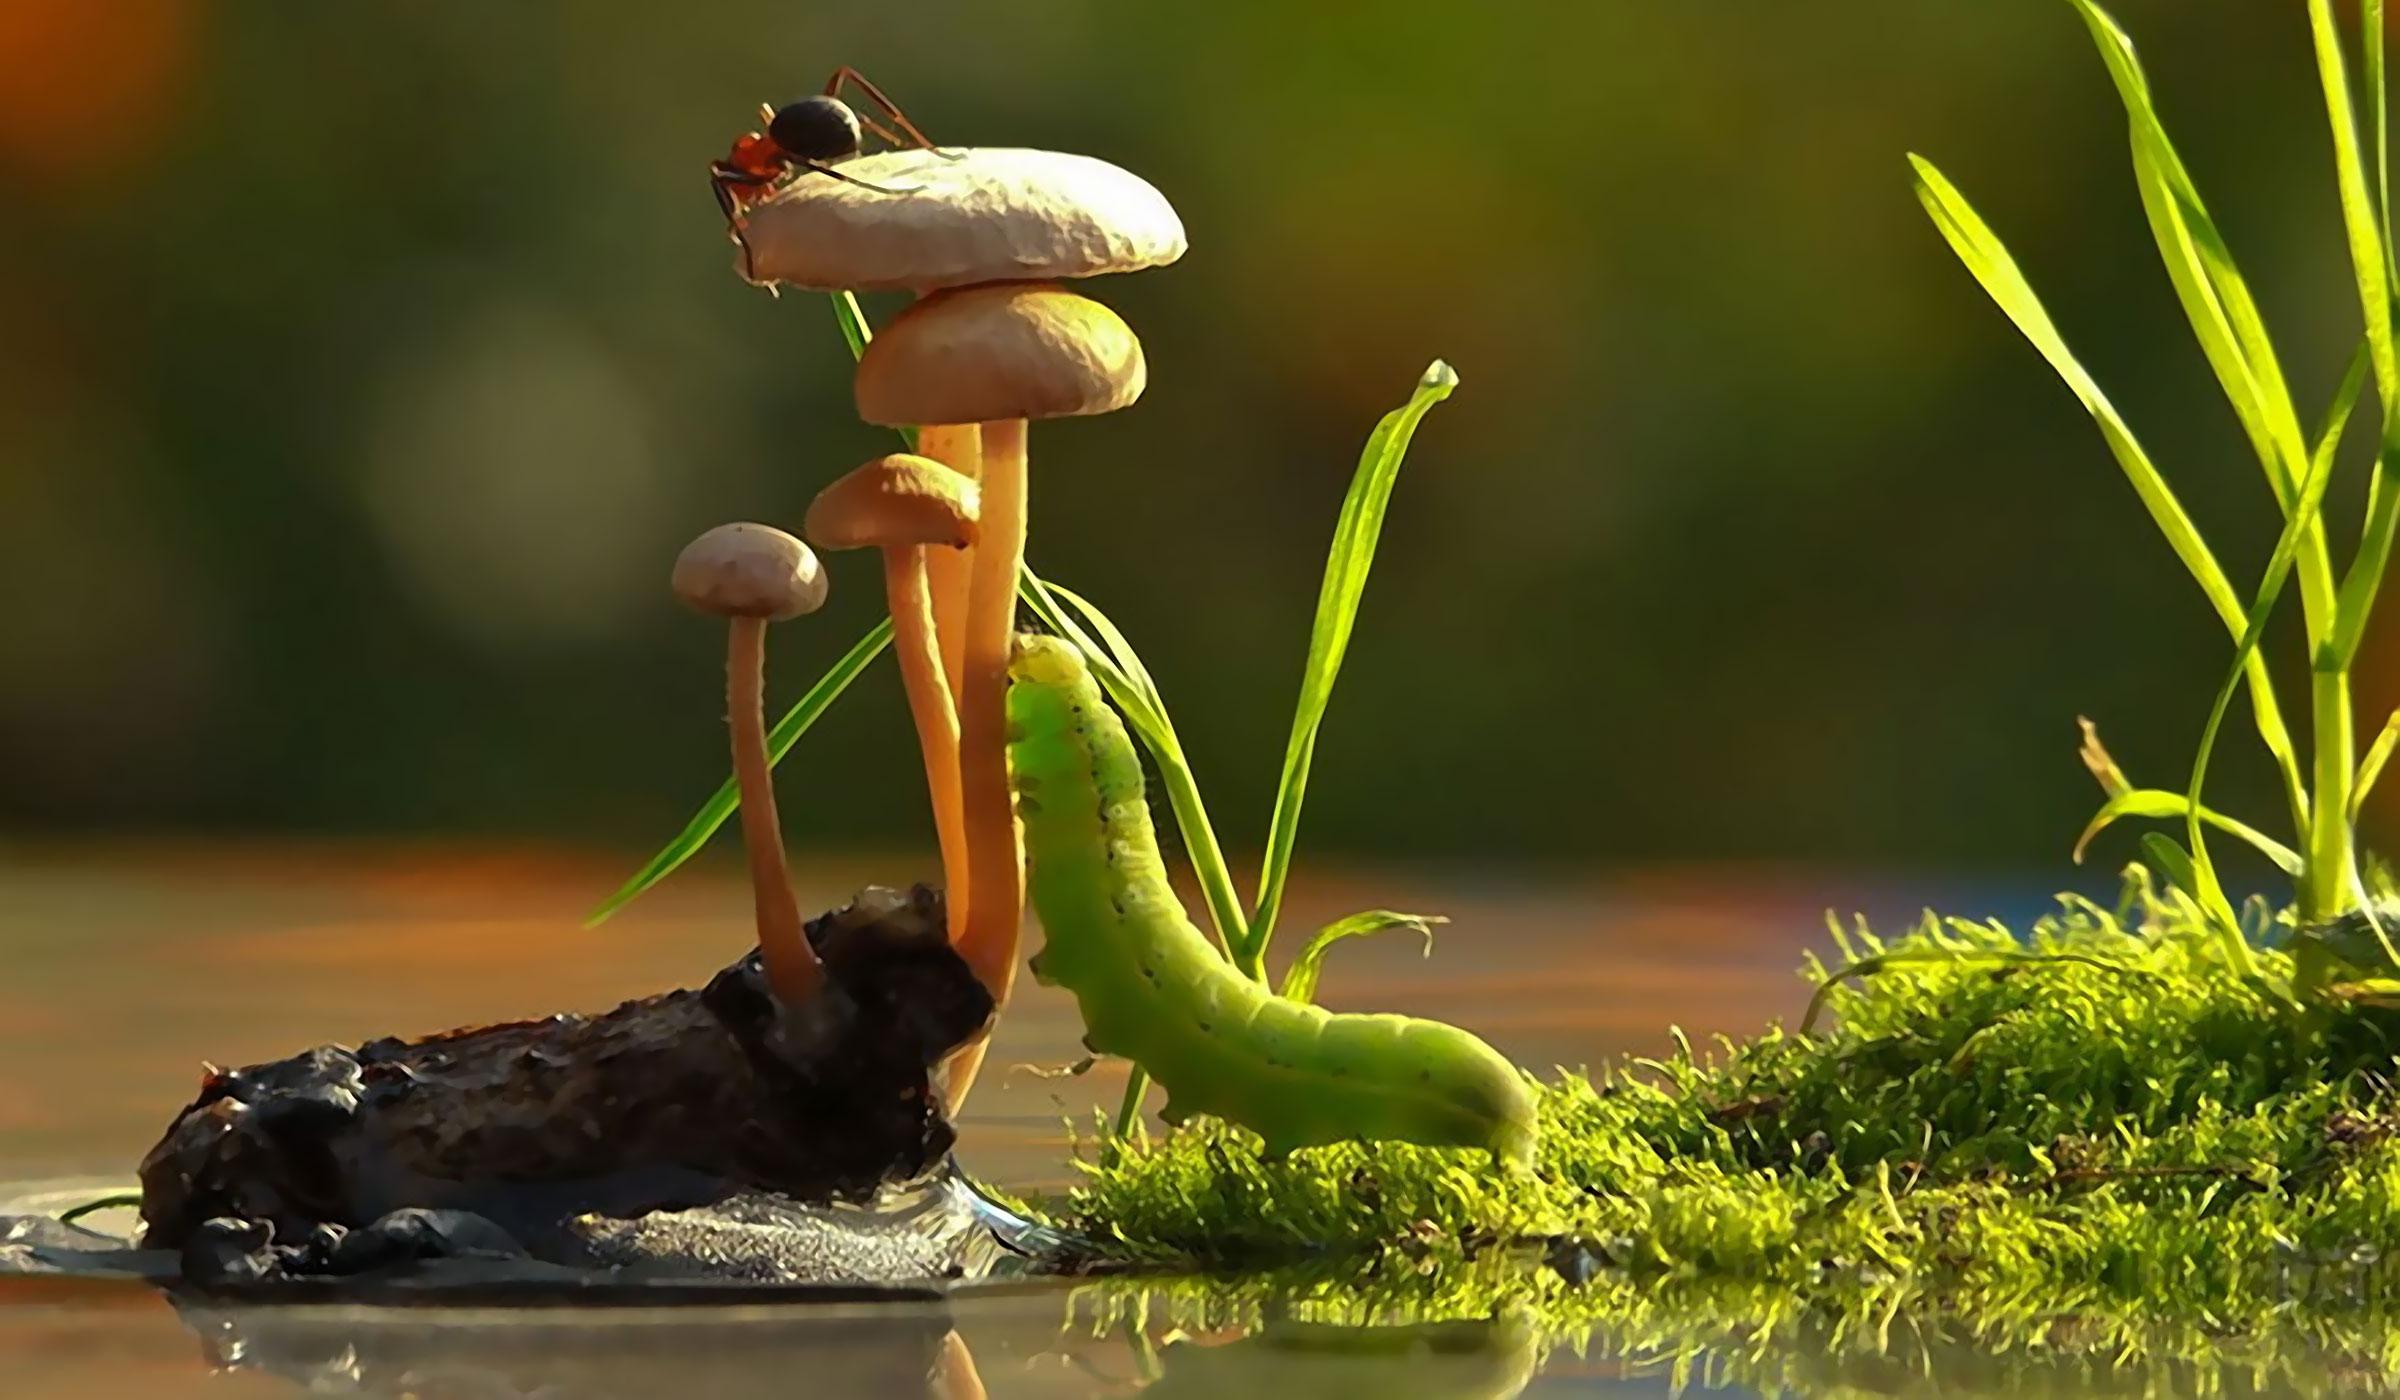 An Incredible World of Mushrooms